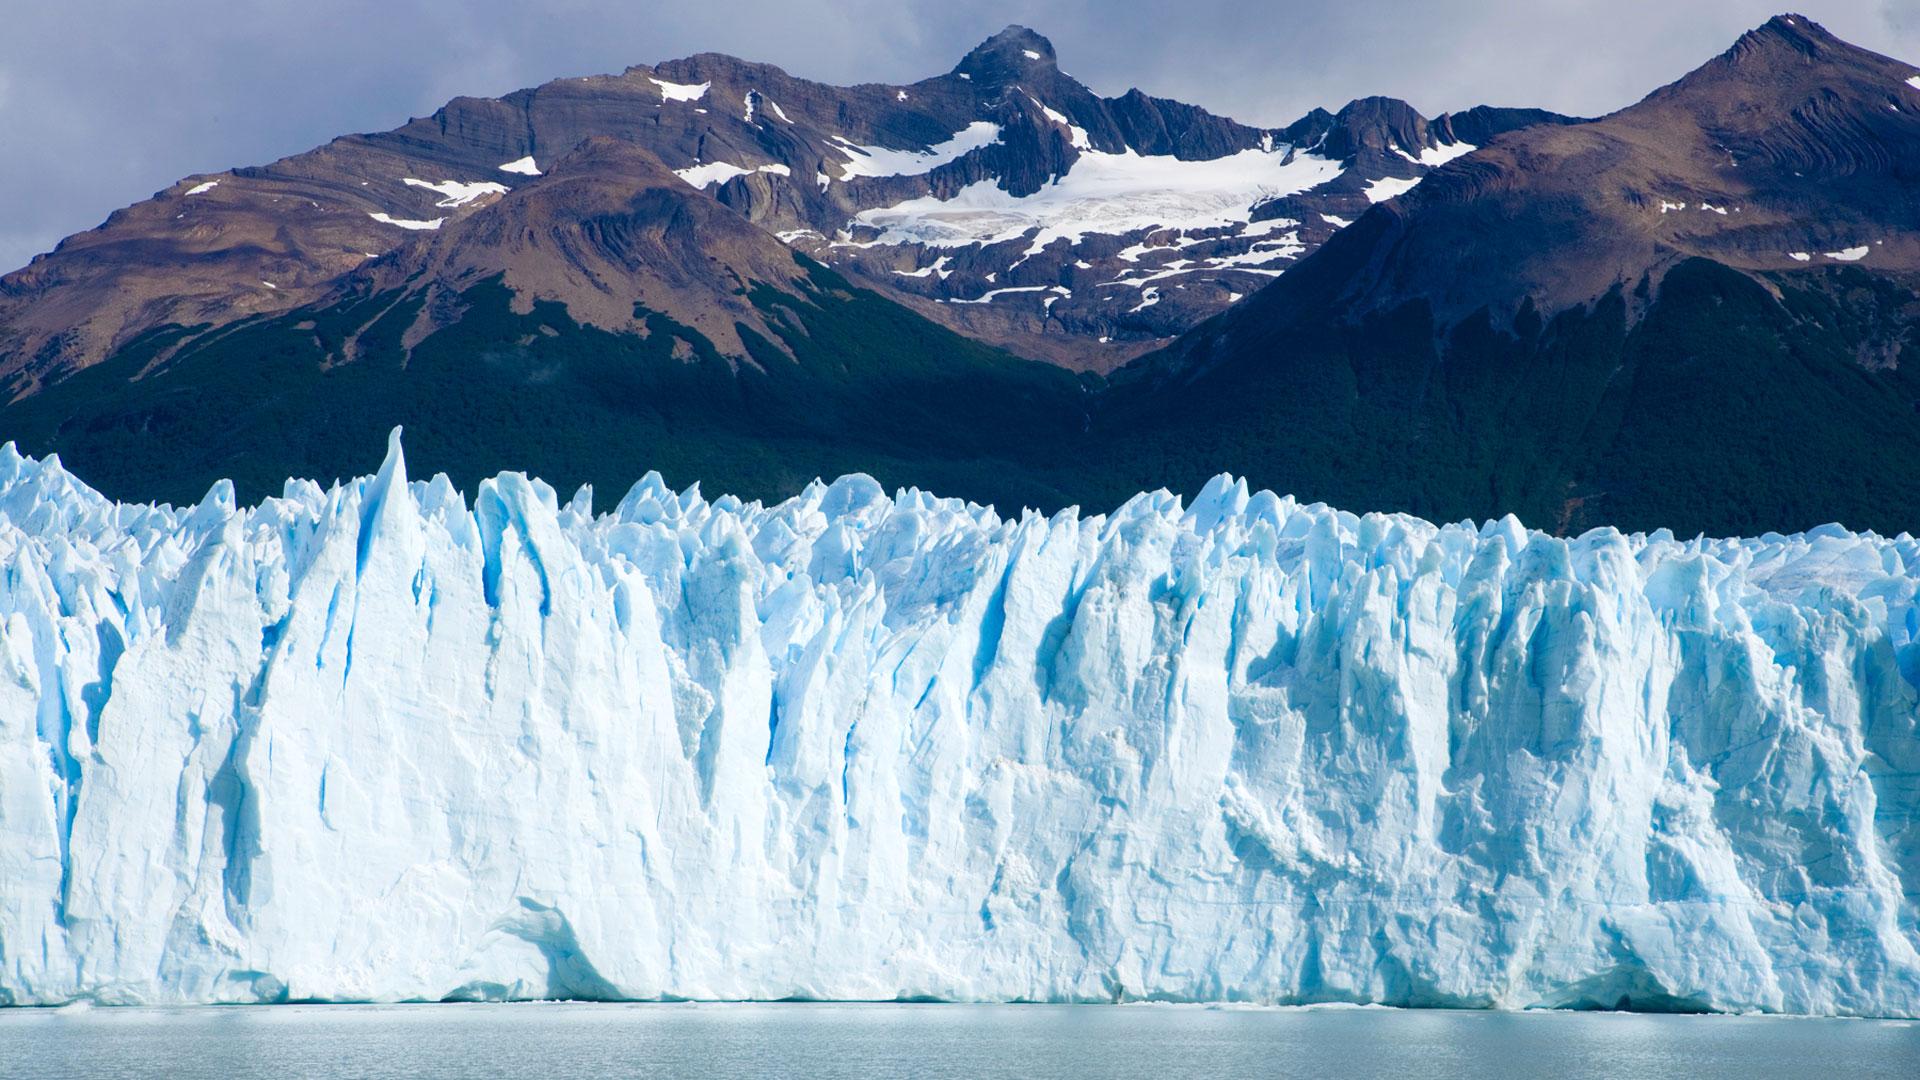 Perito Moreno Glacier near El Calafate, Argentina